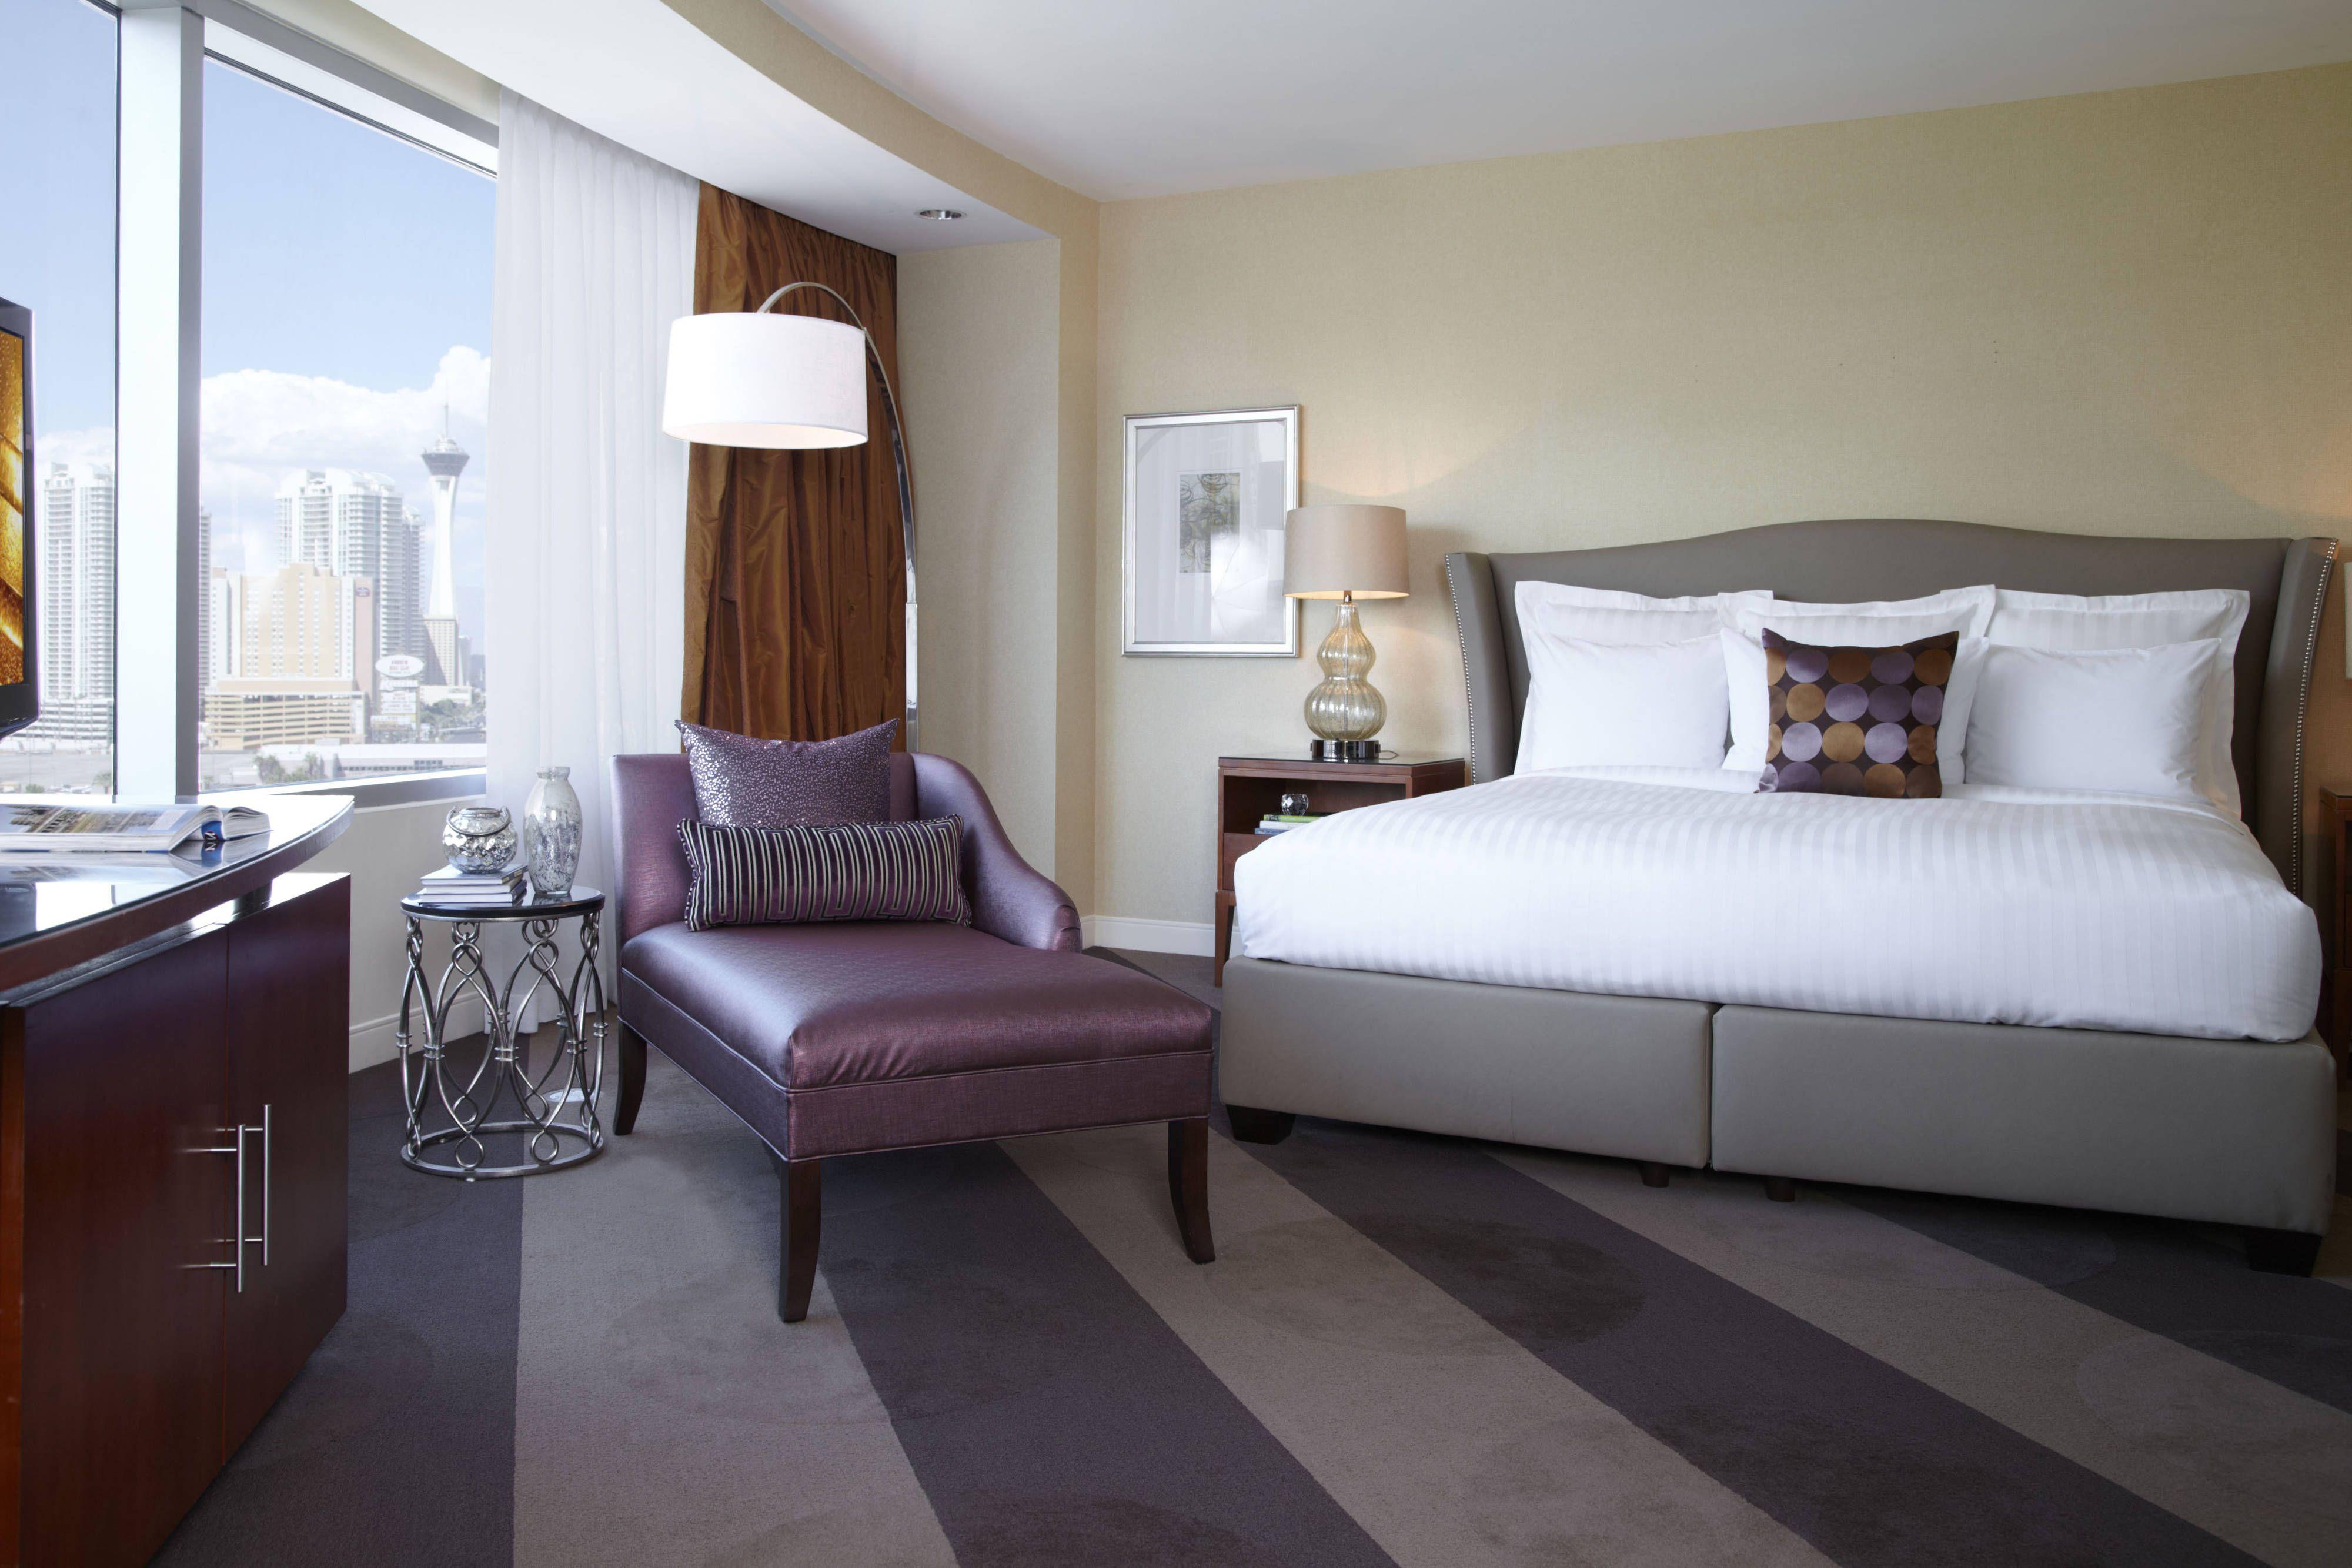 Renaissance Las Vegas Hotel Vip Suite Bedroom Guestbathroom Beautiful Traveling Hotel Las Vegas Hotels Hotel Price